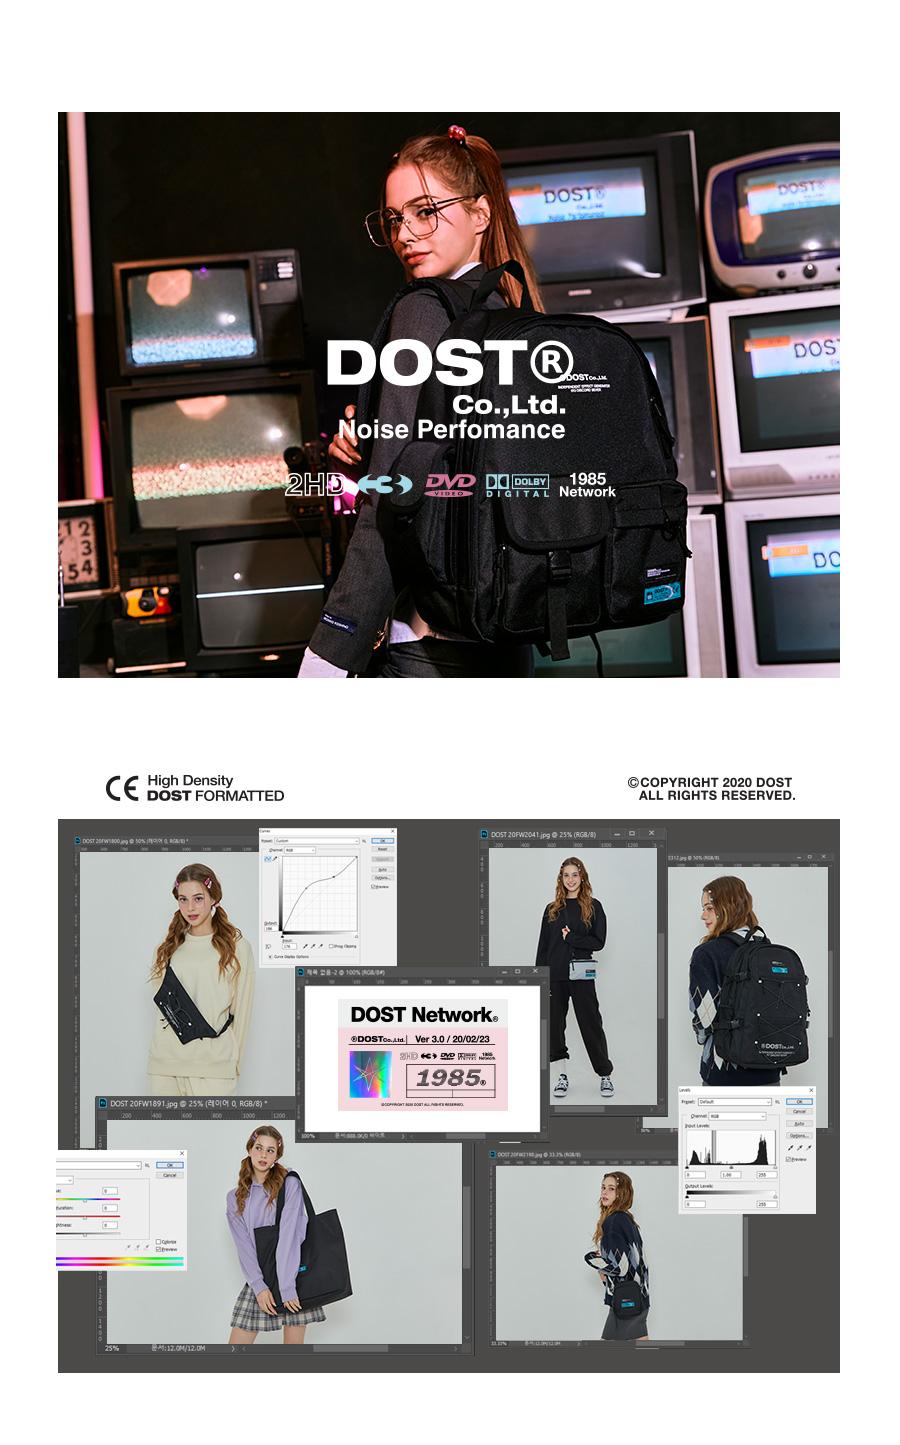 DOST_2020_TOP.jpg